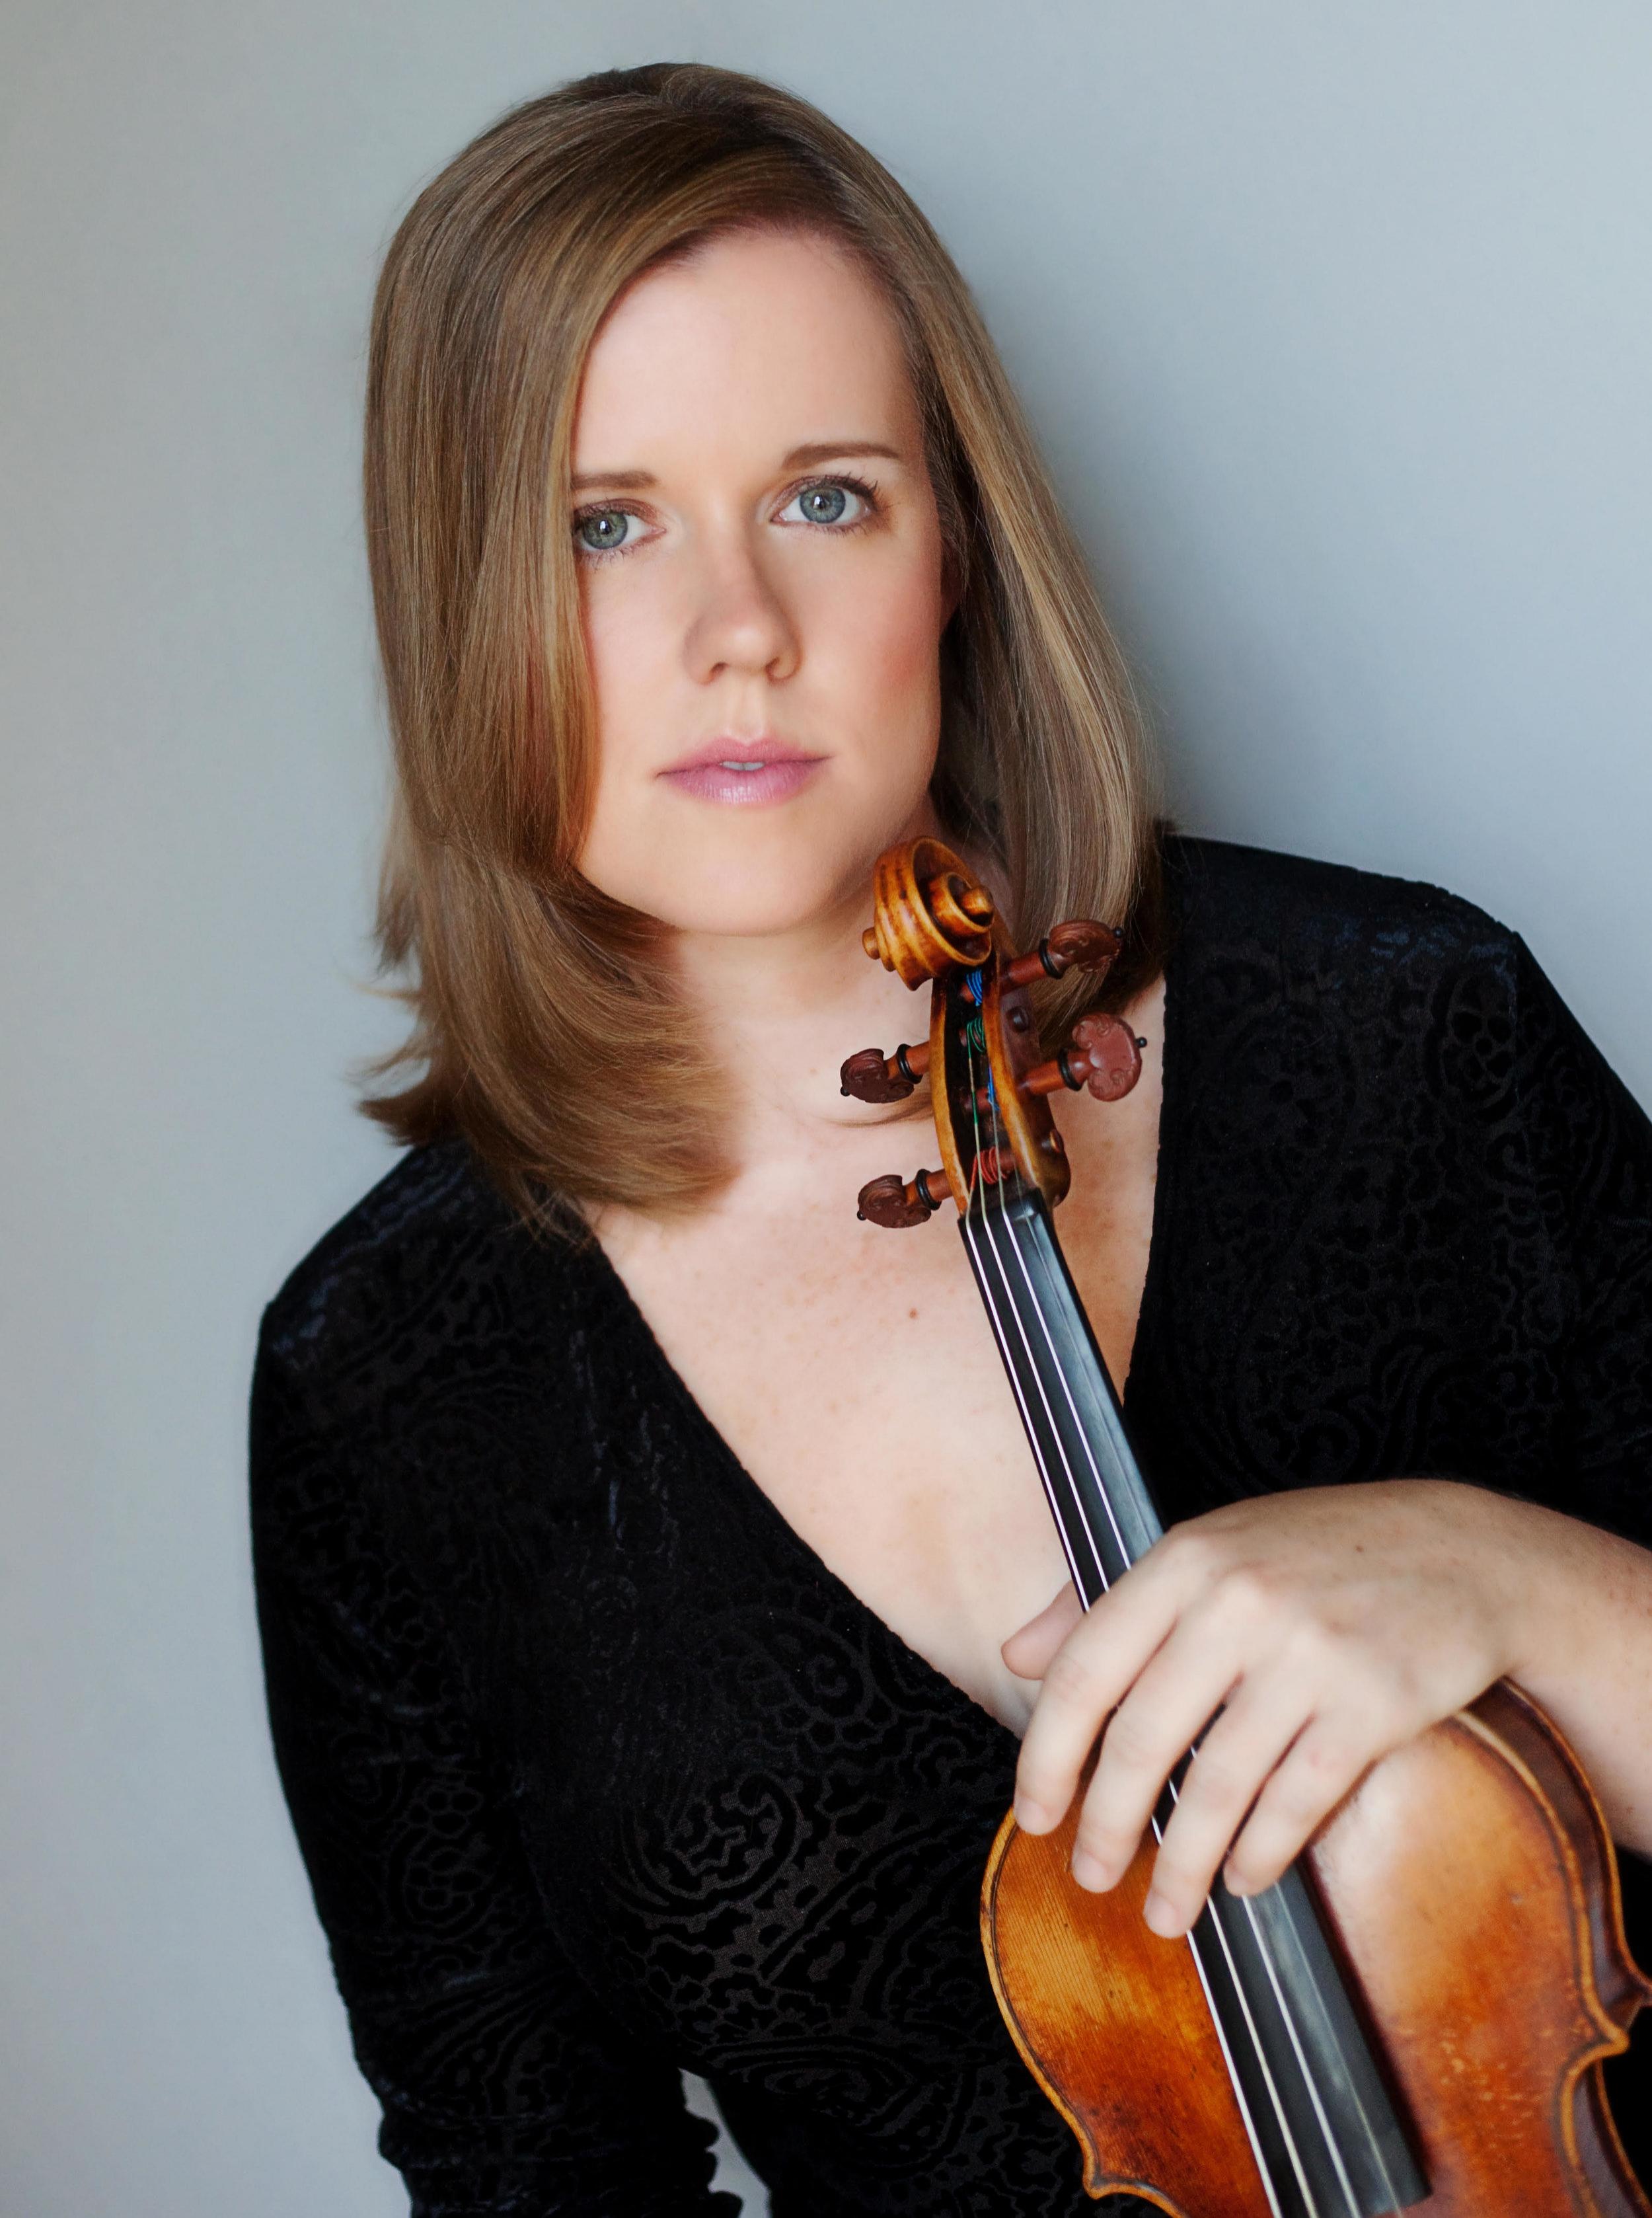 Madeline Adkins - 2018-19 Music Director, NOVA Chamber Music Series